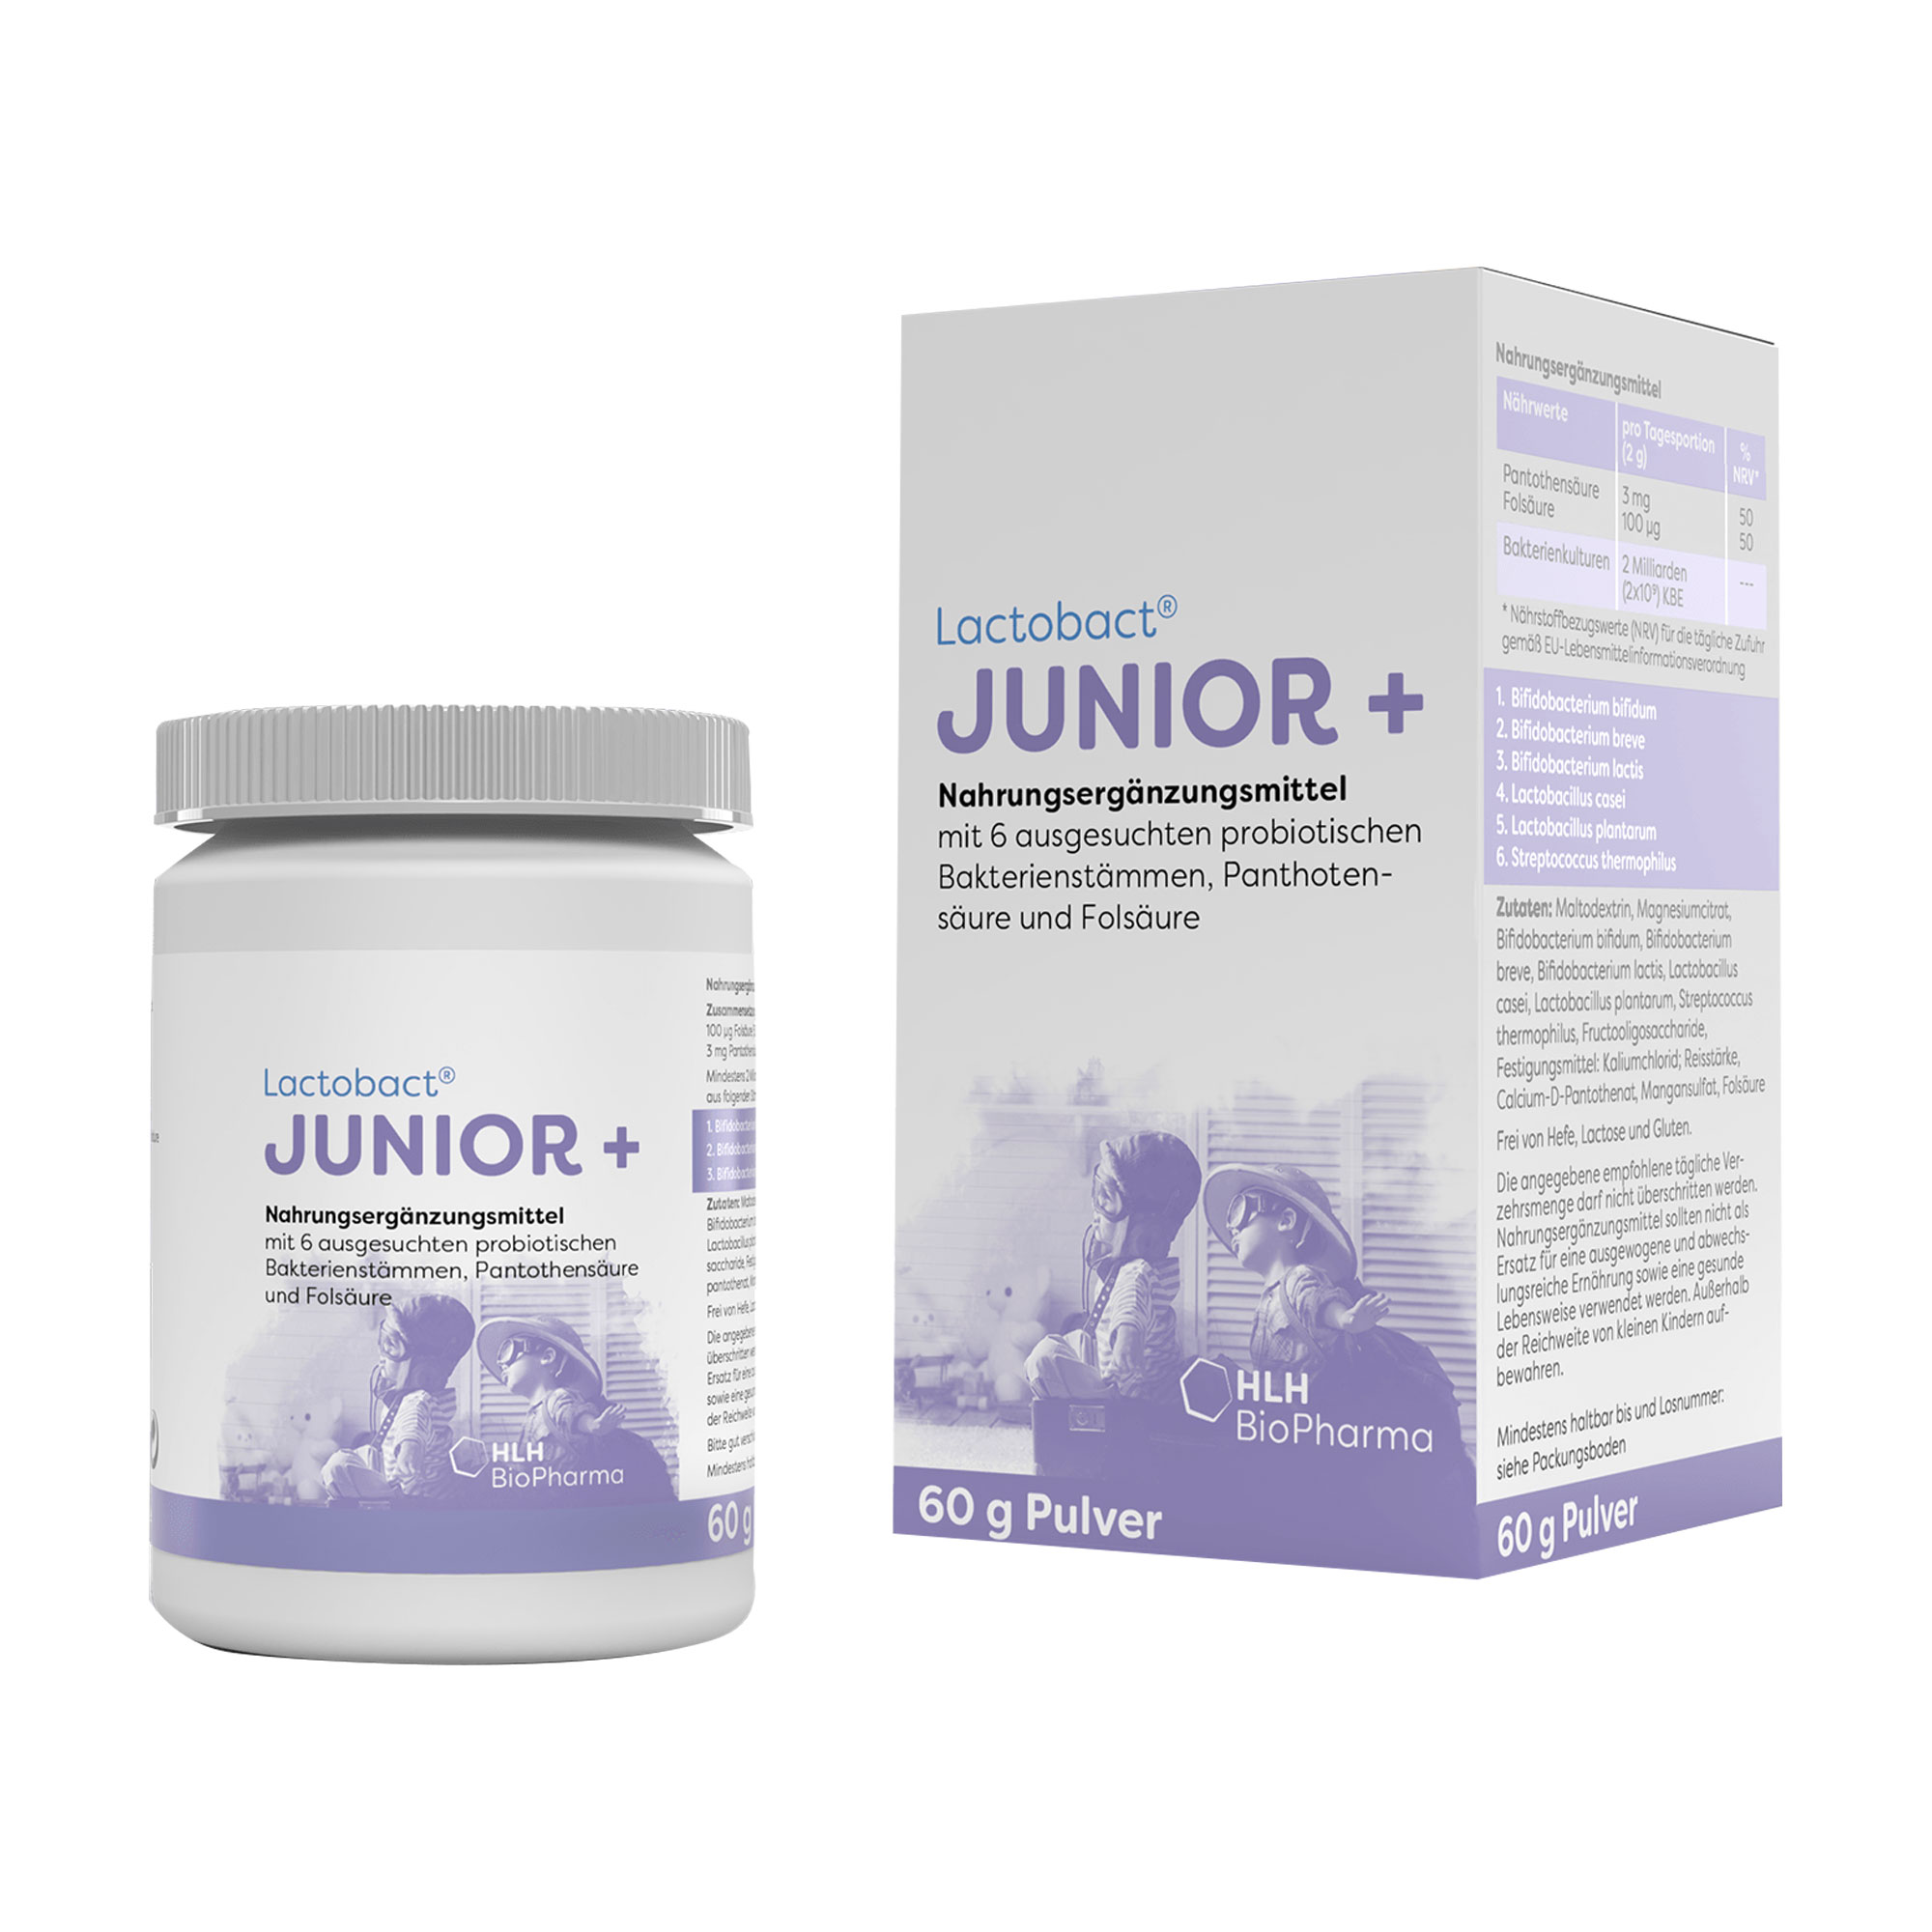 Lactobact Junior+ Monatspackung